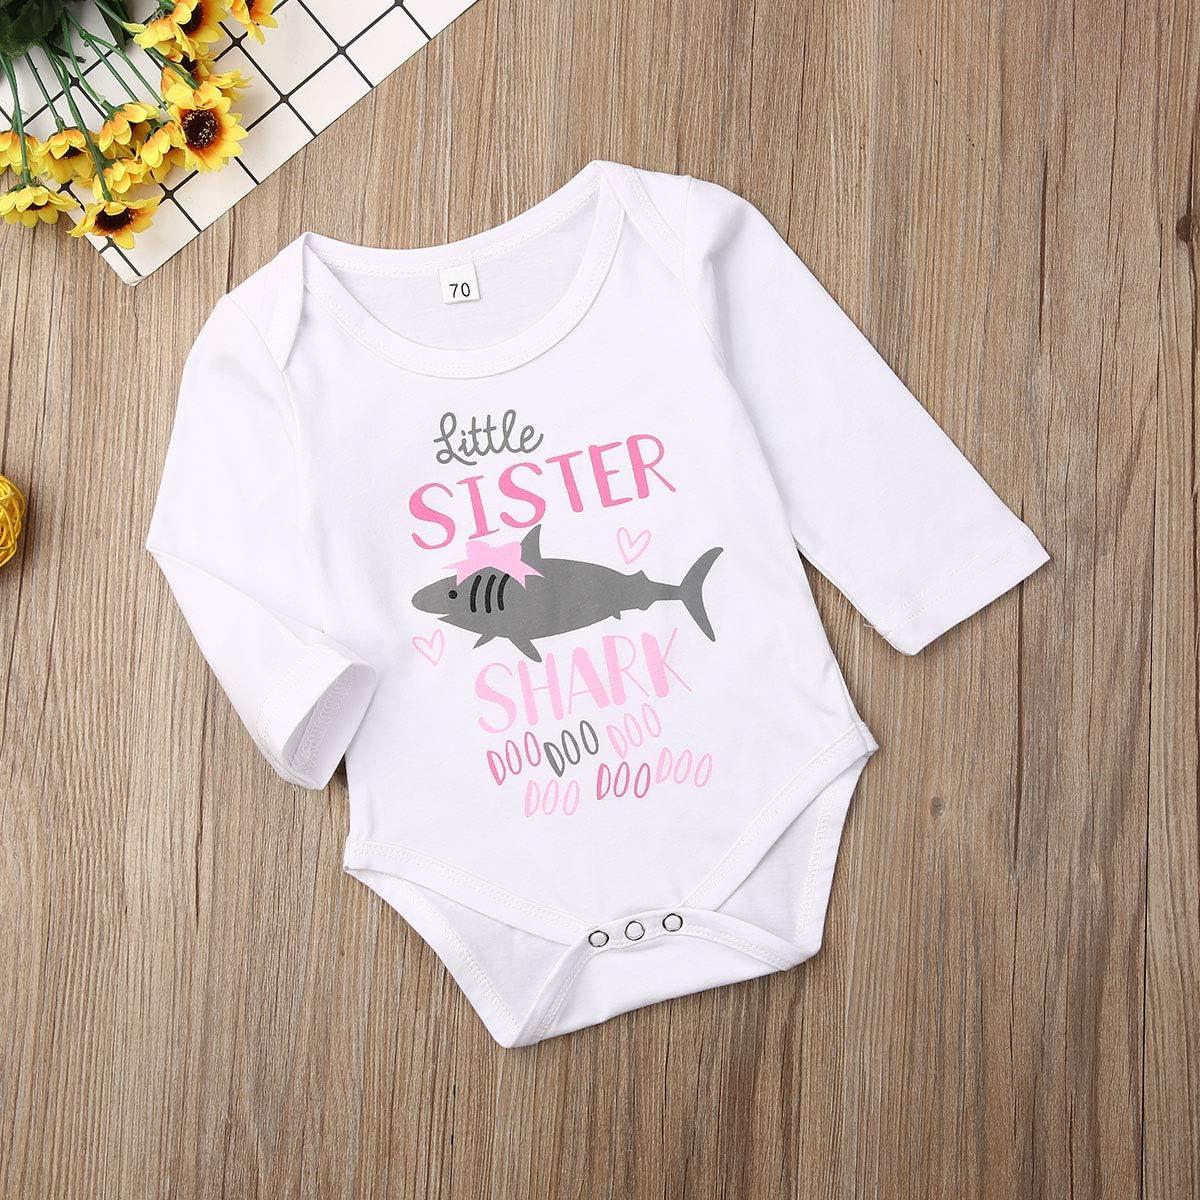 Shirt Sister Brother Matching Summer Clothes Newborn Infant Baby Boys Short Sleeve Romper Kids Toddler Girls Shark T